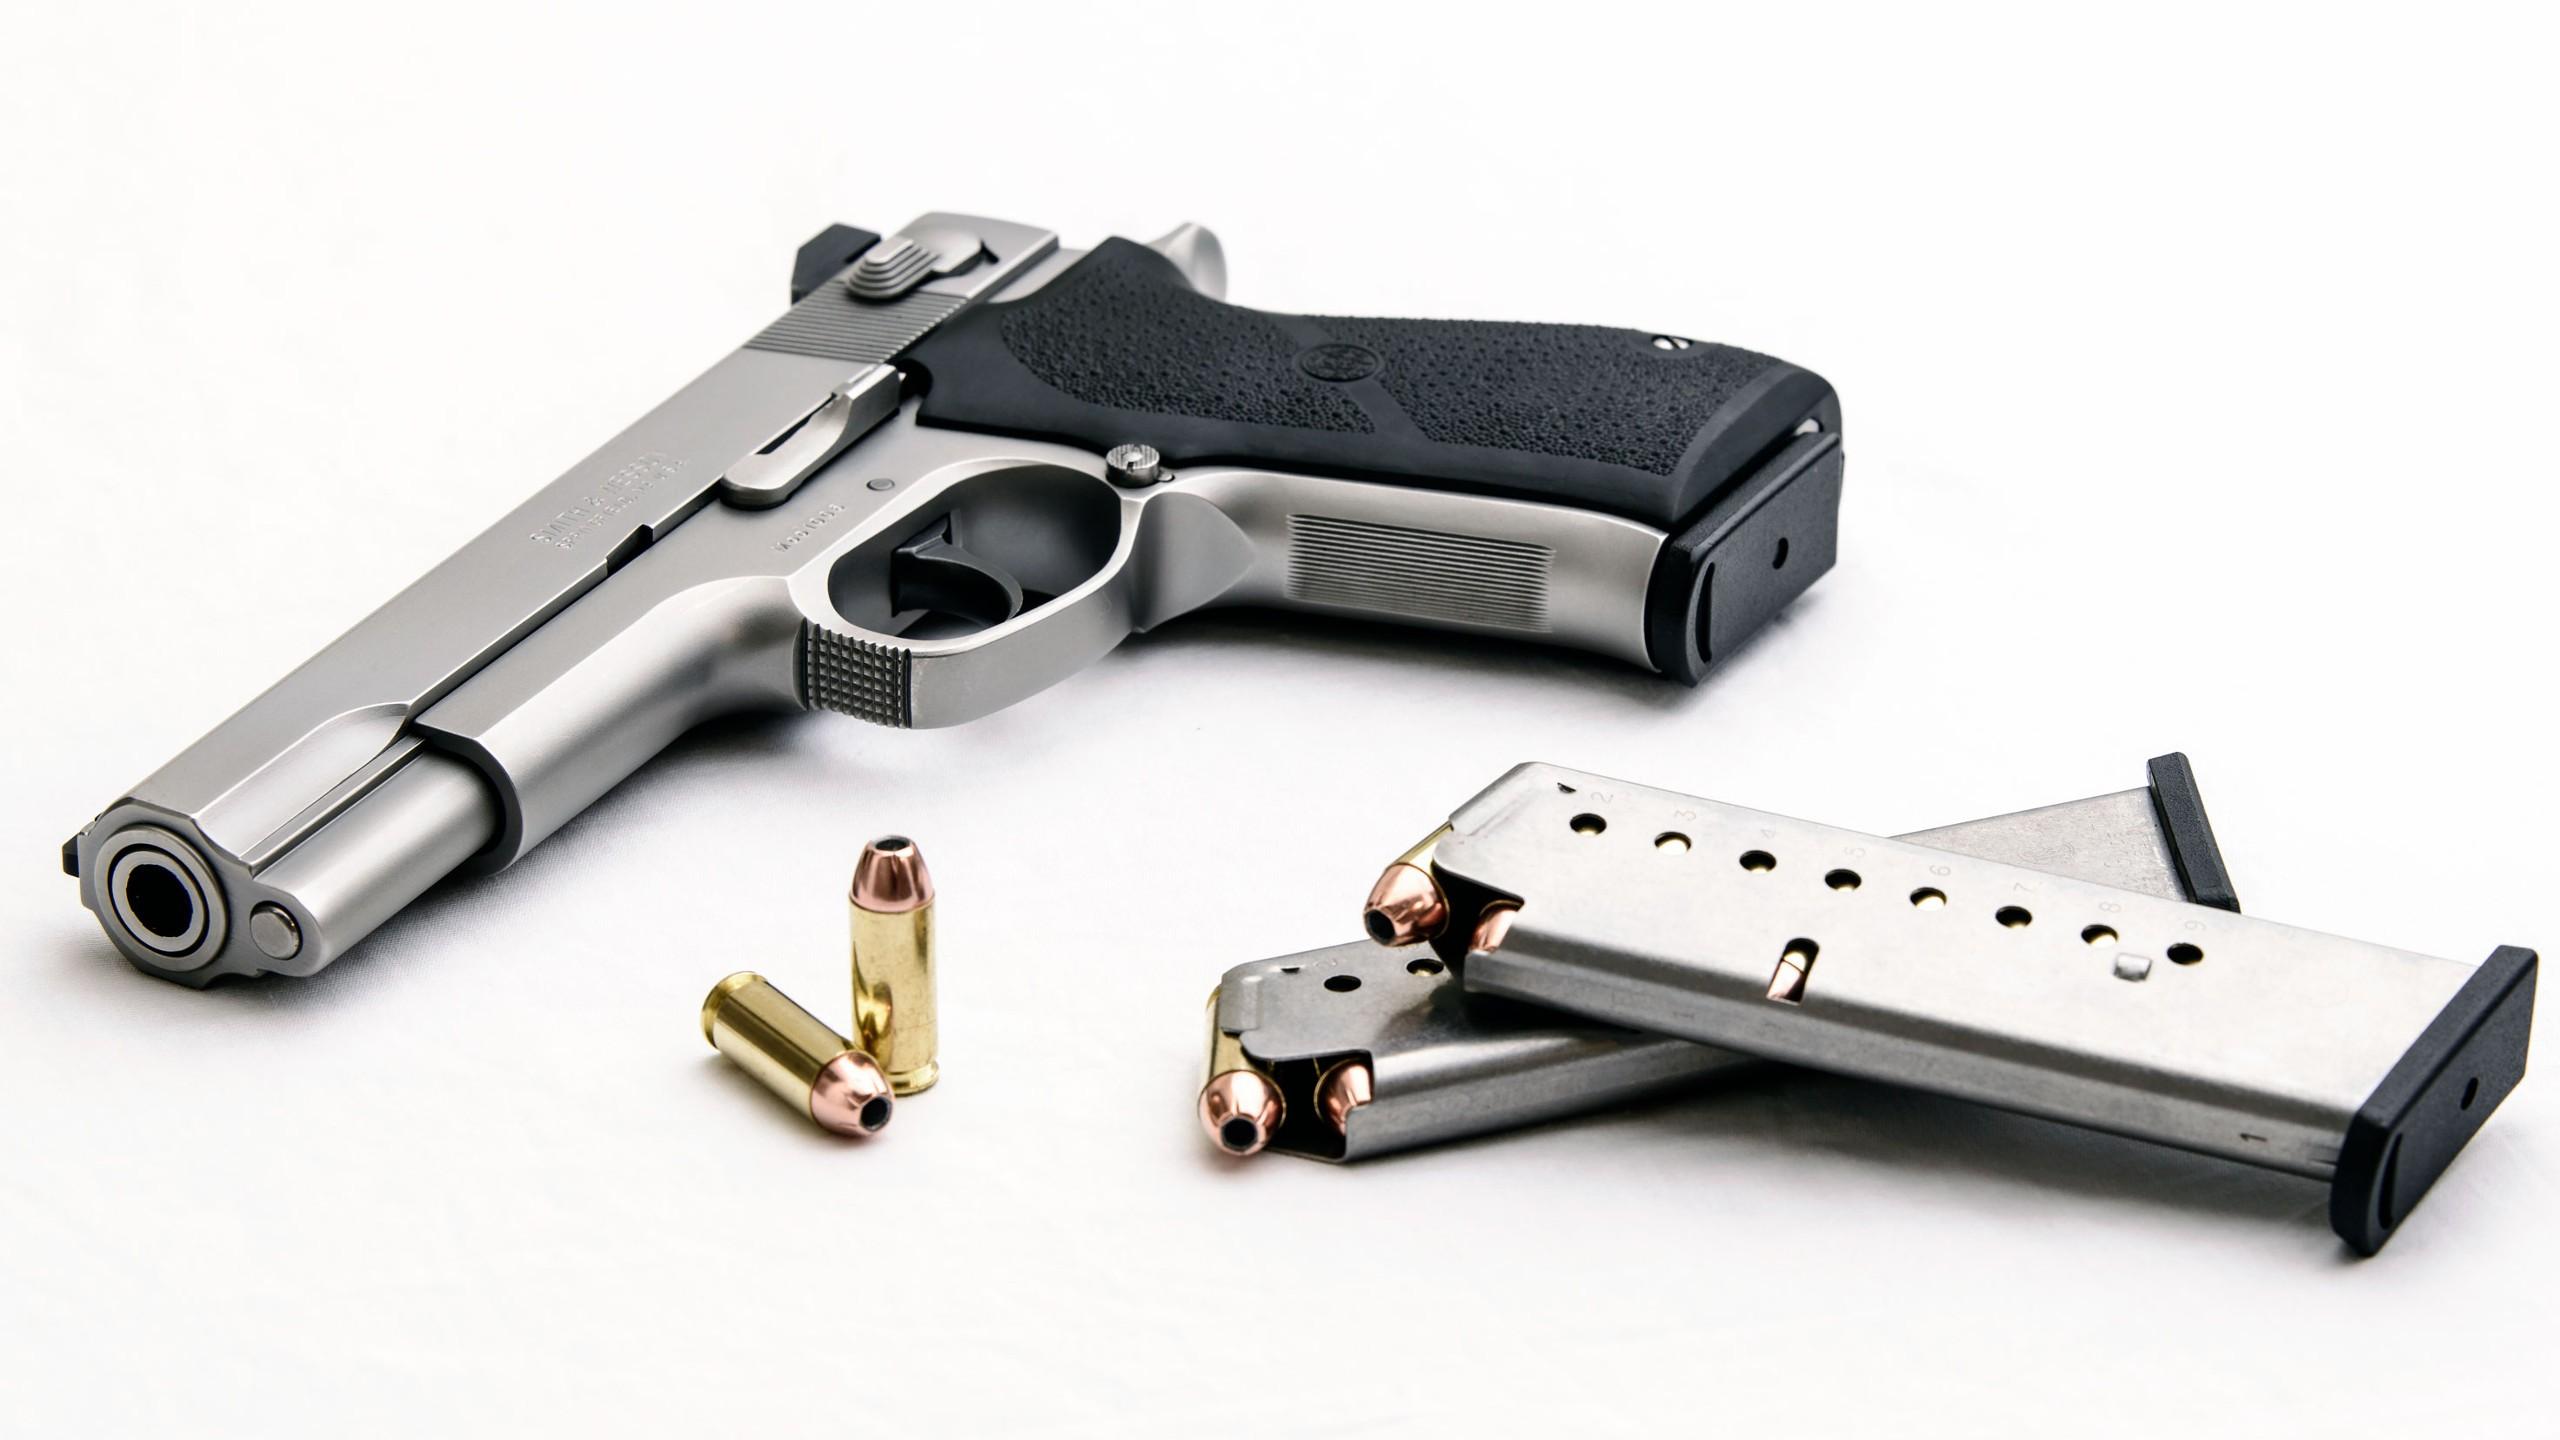 pistol smith & wesson gun